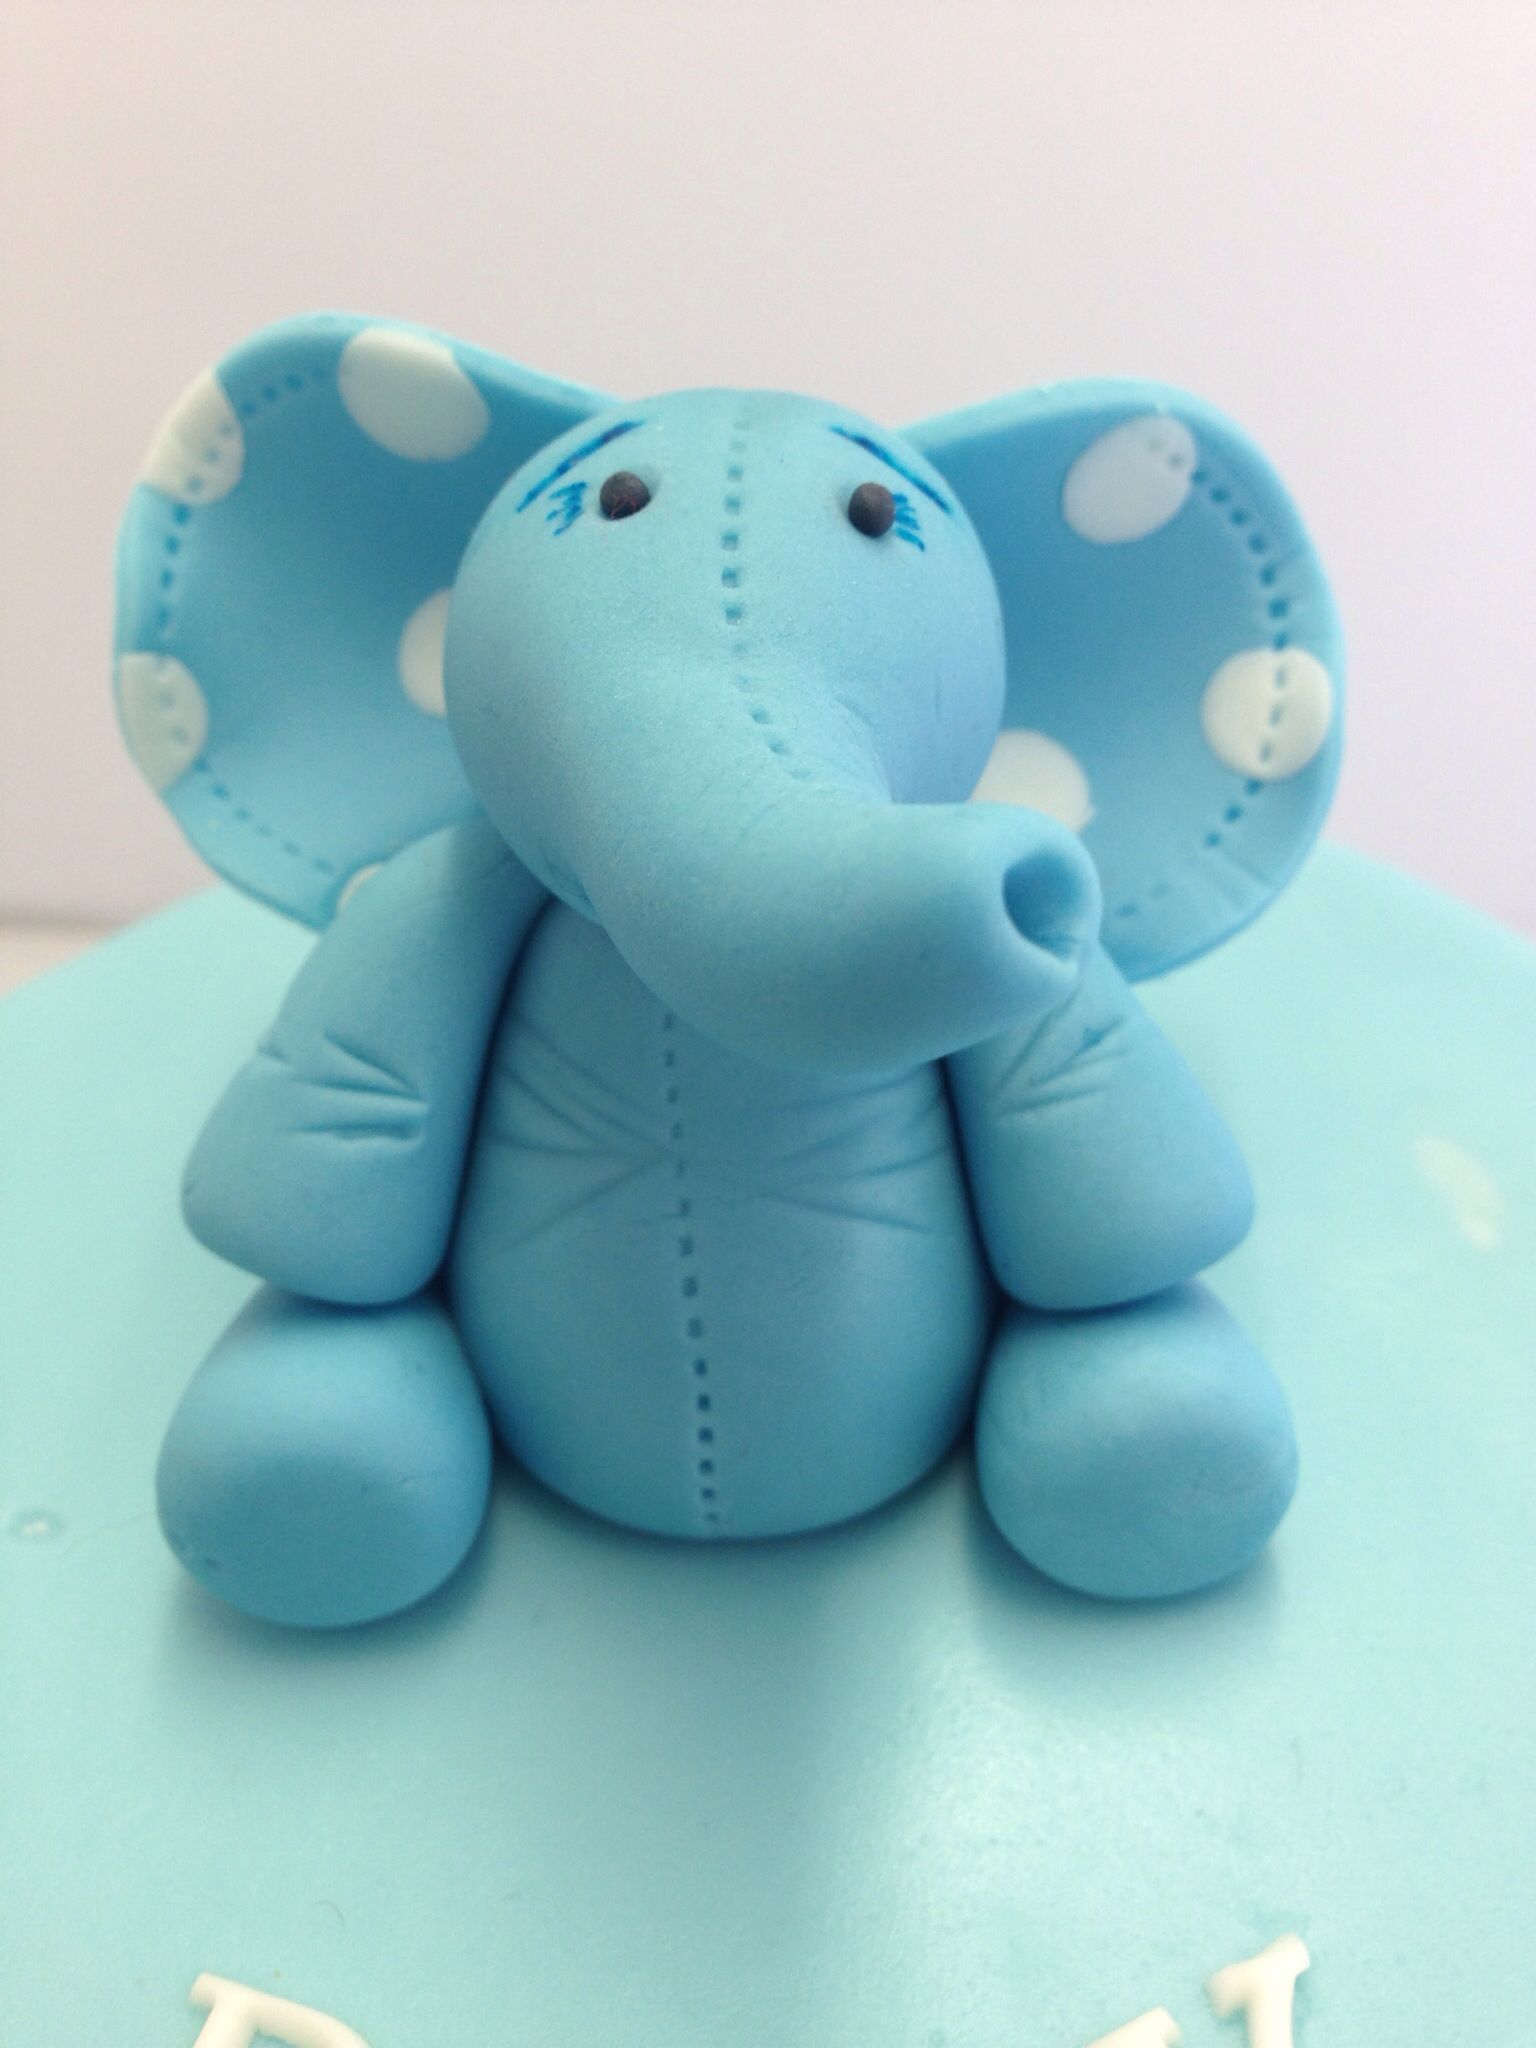 Fondant Elephant Theowlbakery Com Fondant For Cakes